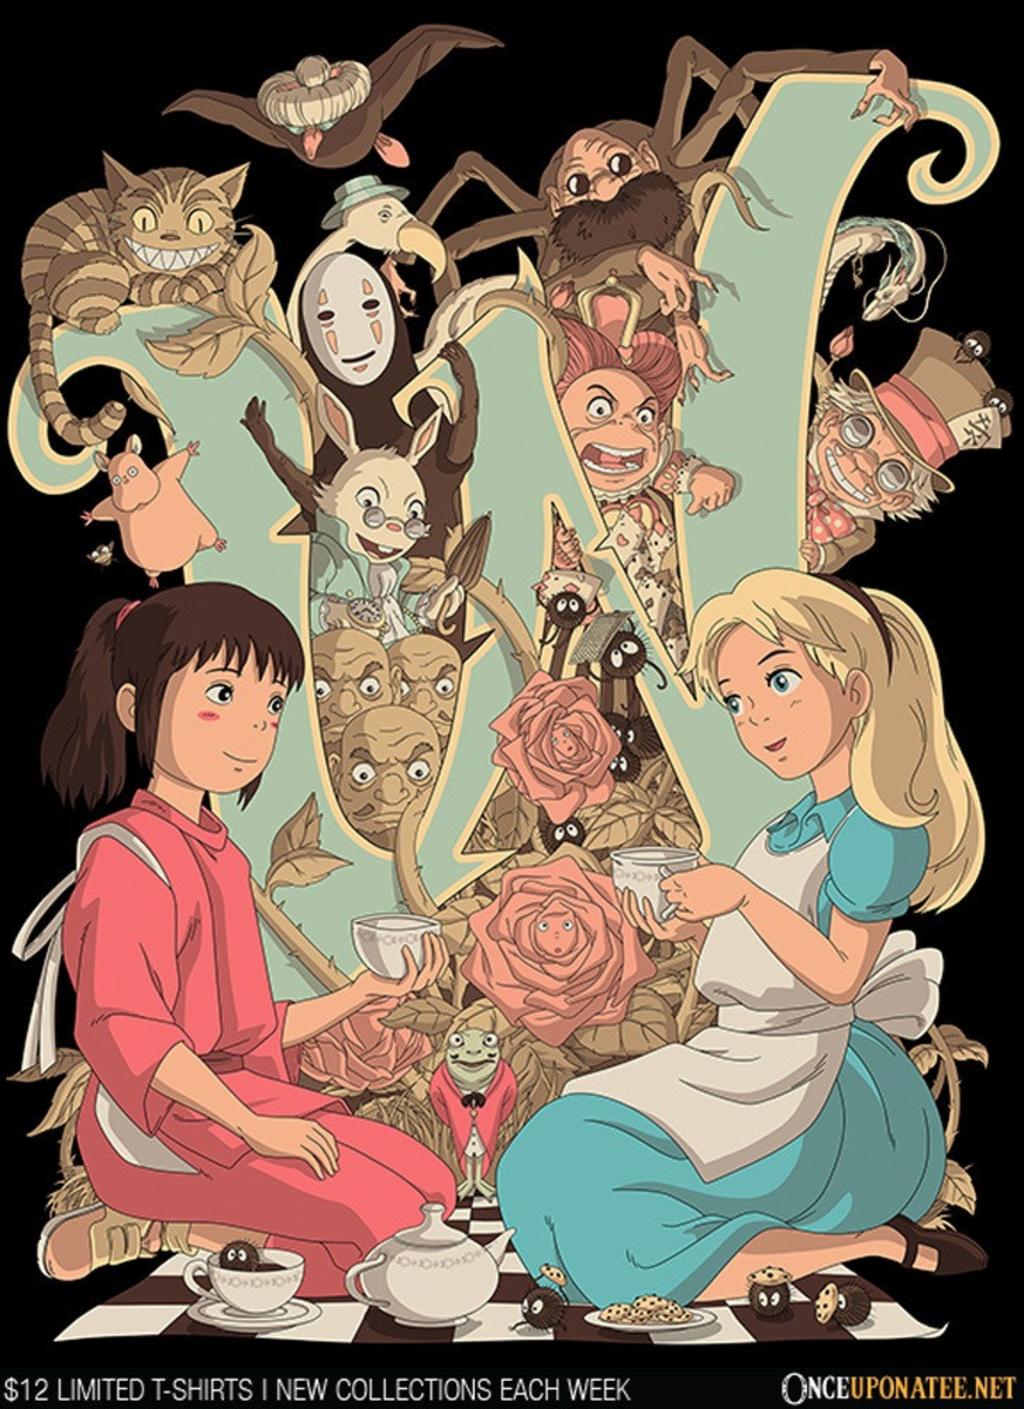 Once Upon a Tee: Wonderlands